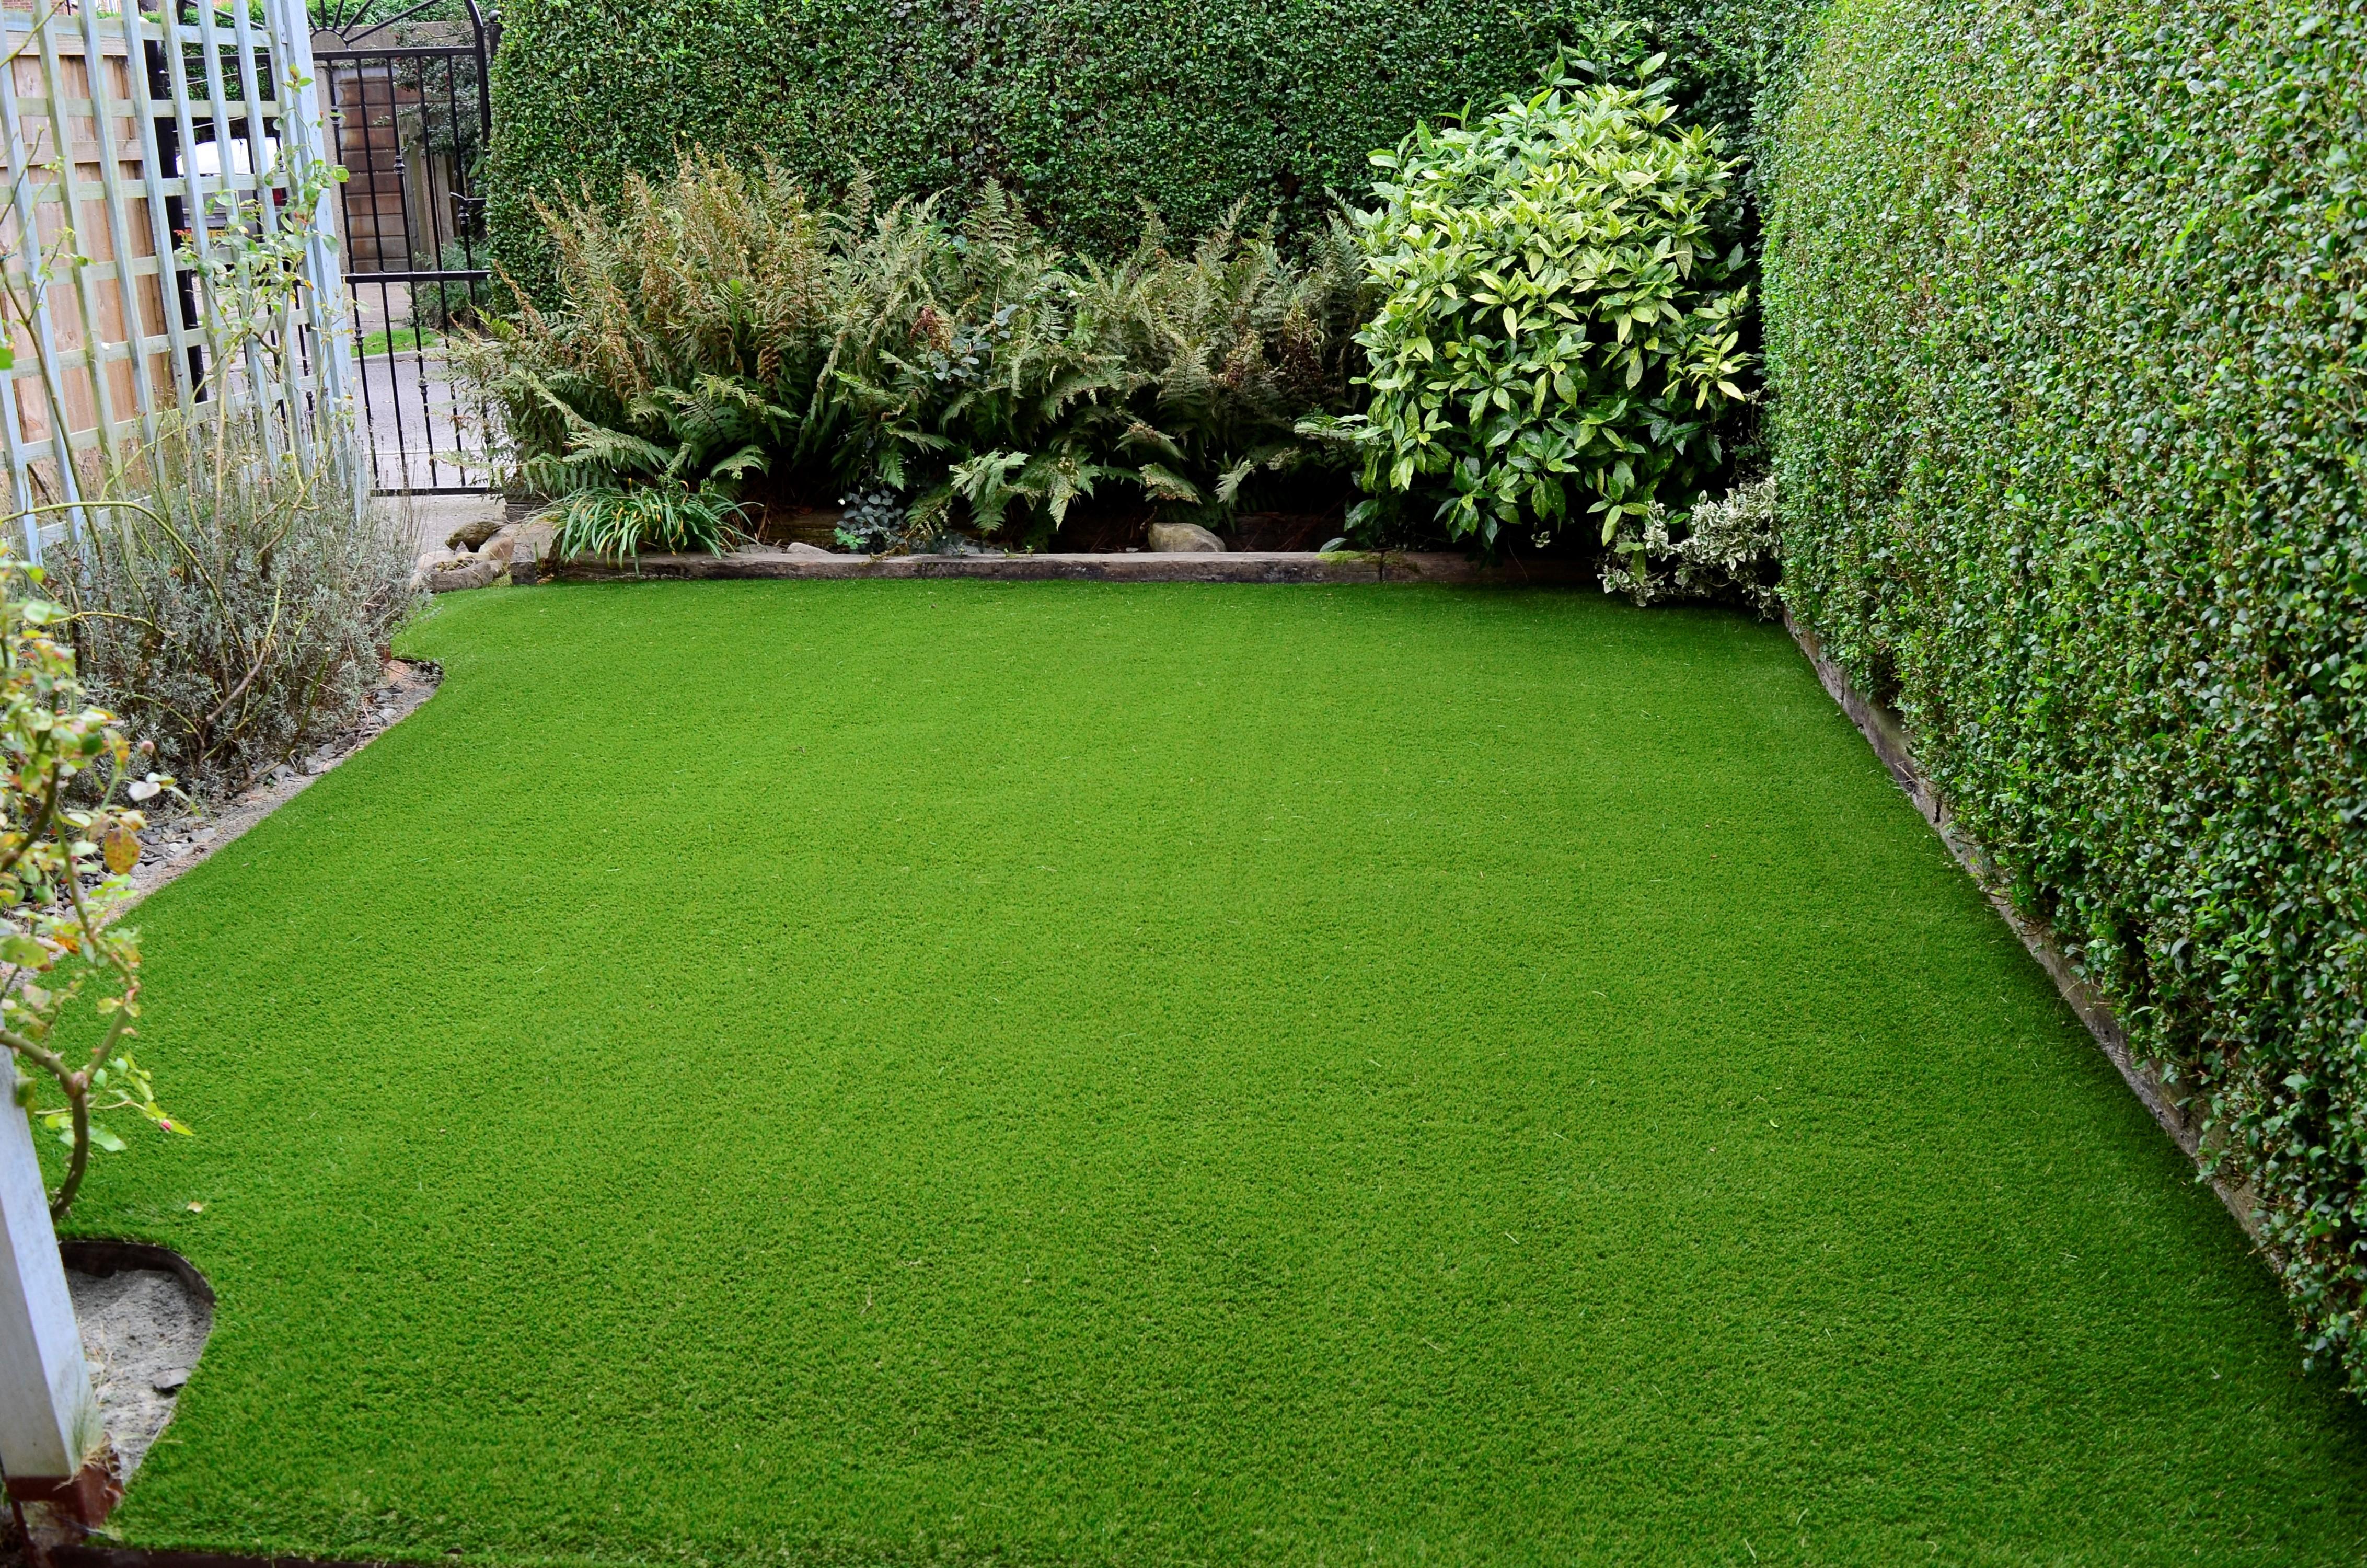 Artificial-Turf-Backyard-2 - Genesis Turf